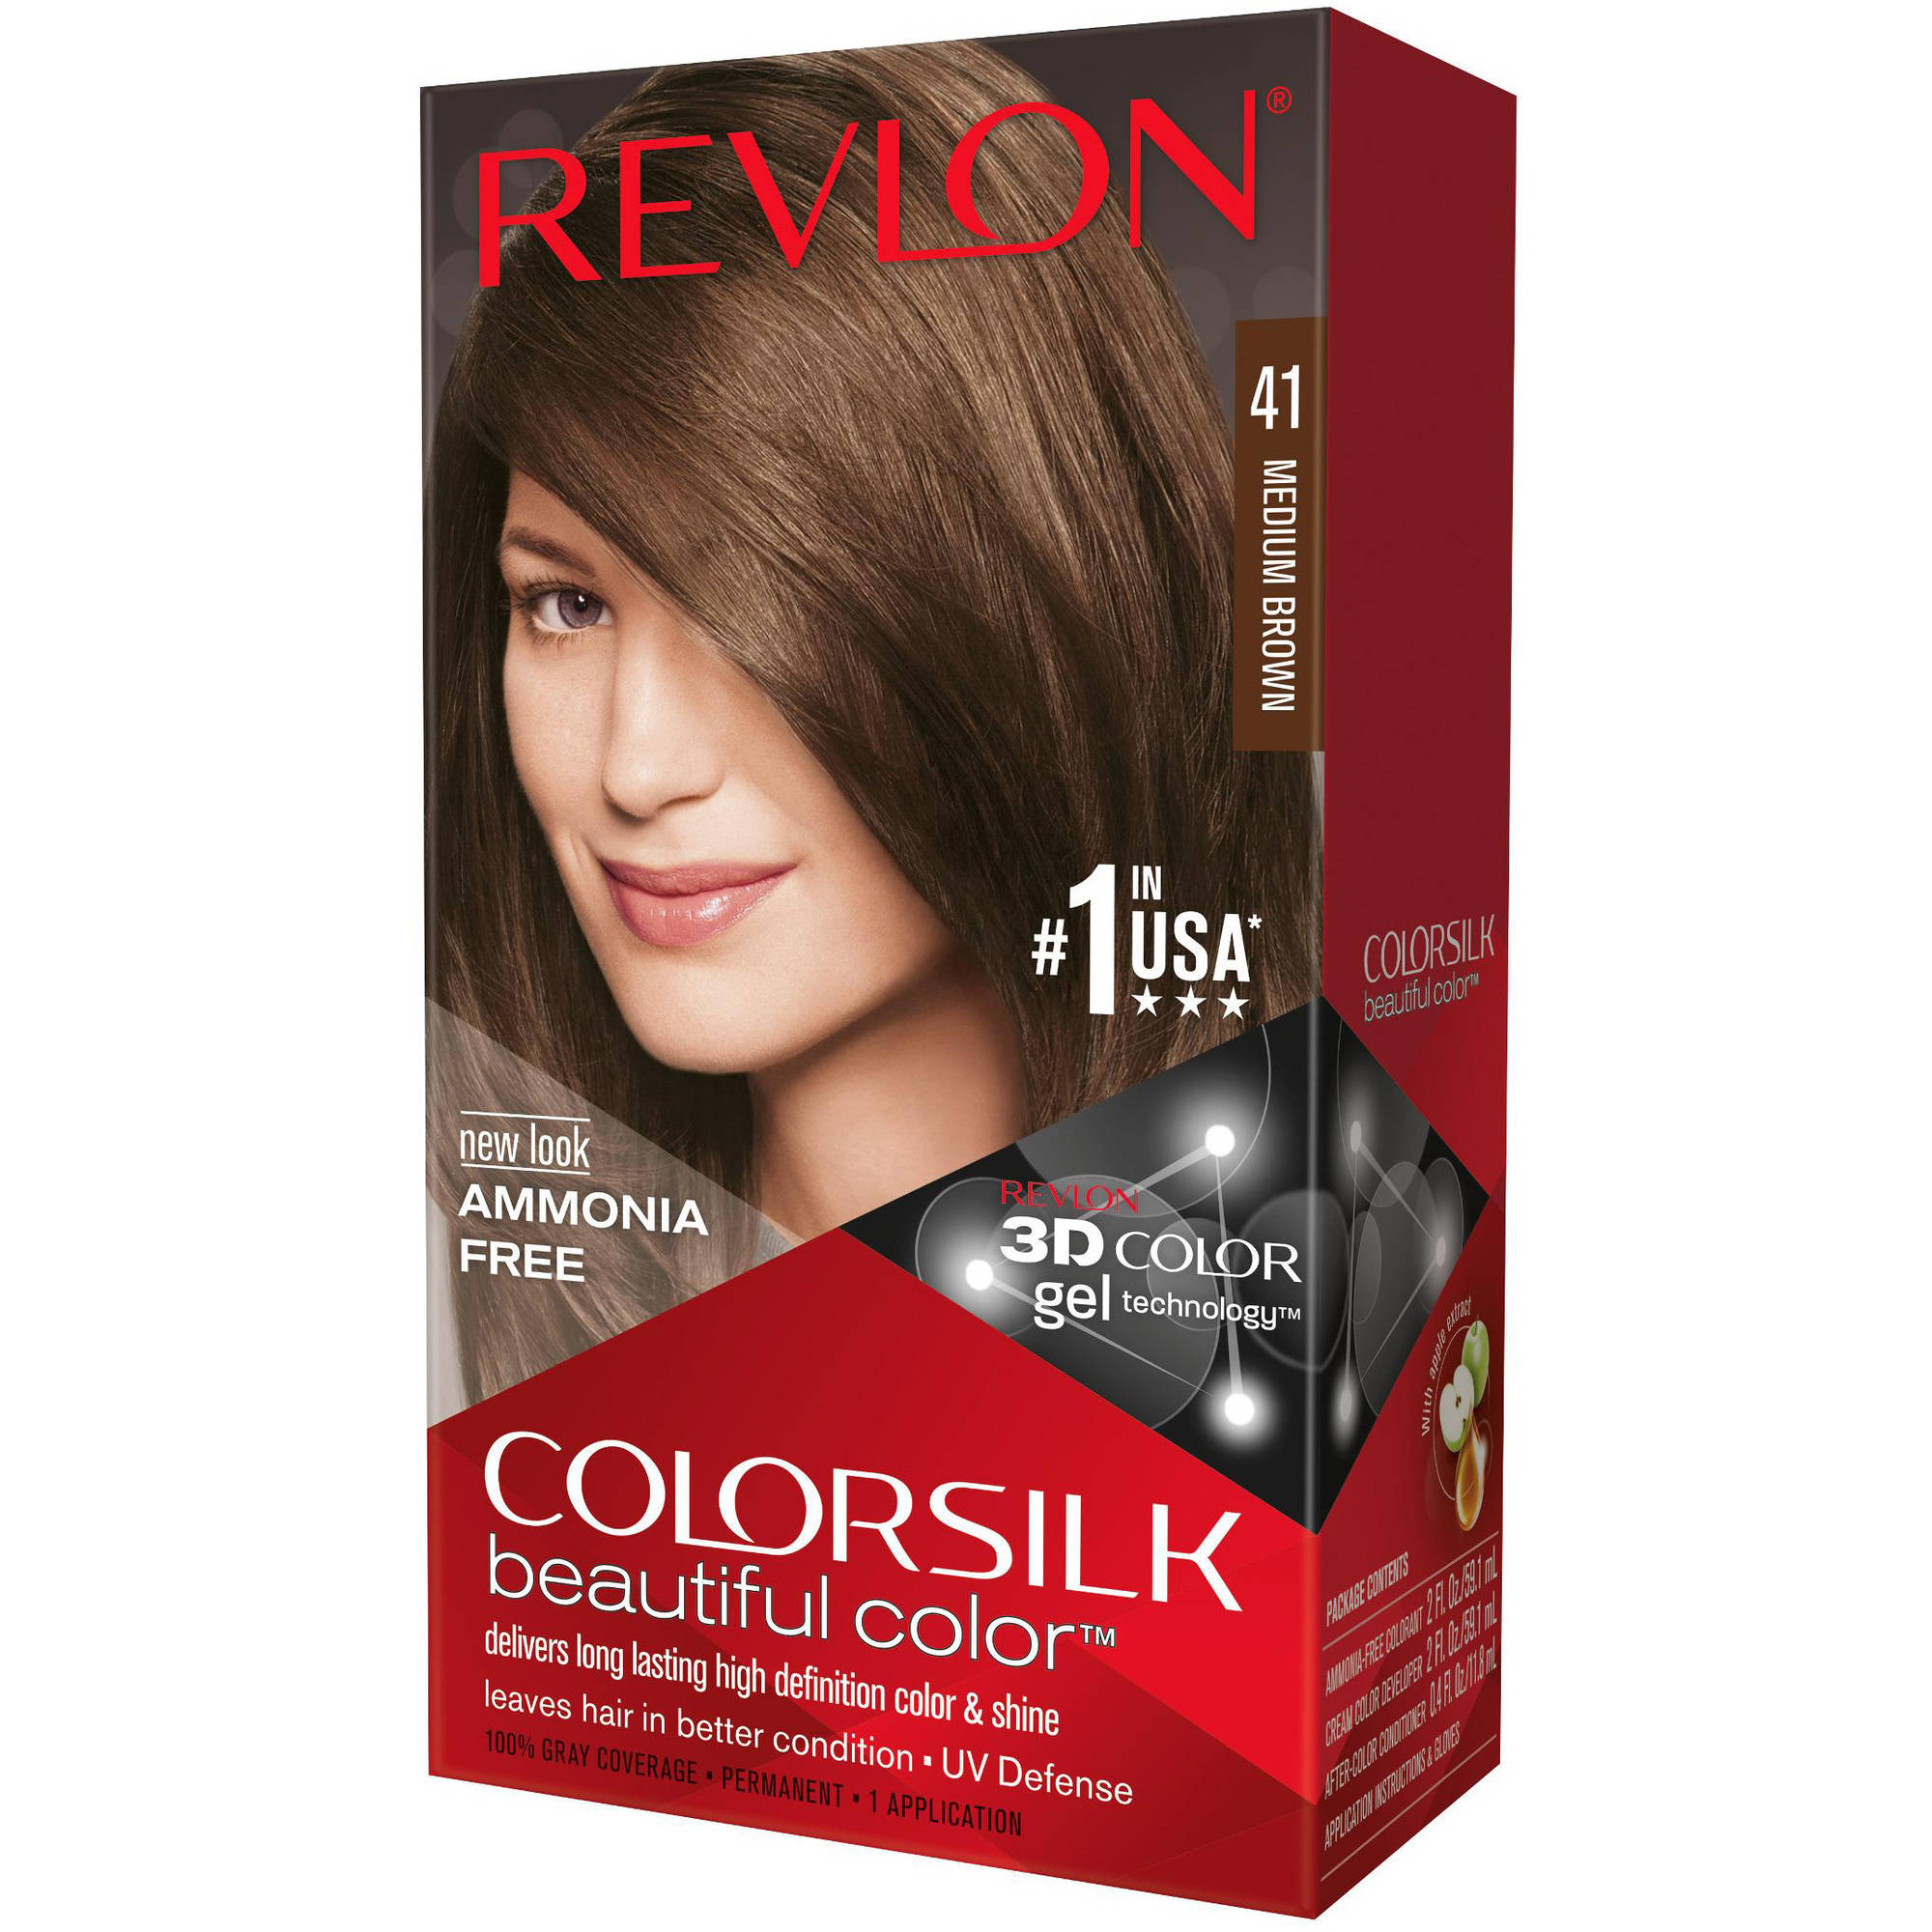 Revlon Colorsilk Beautiful Color Permanent Hair Color, 41 Medium Brown